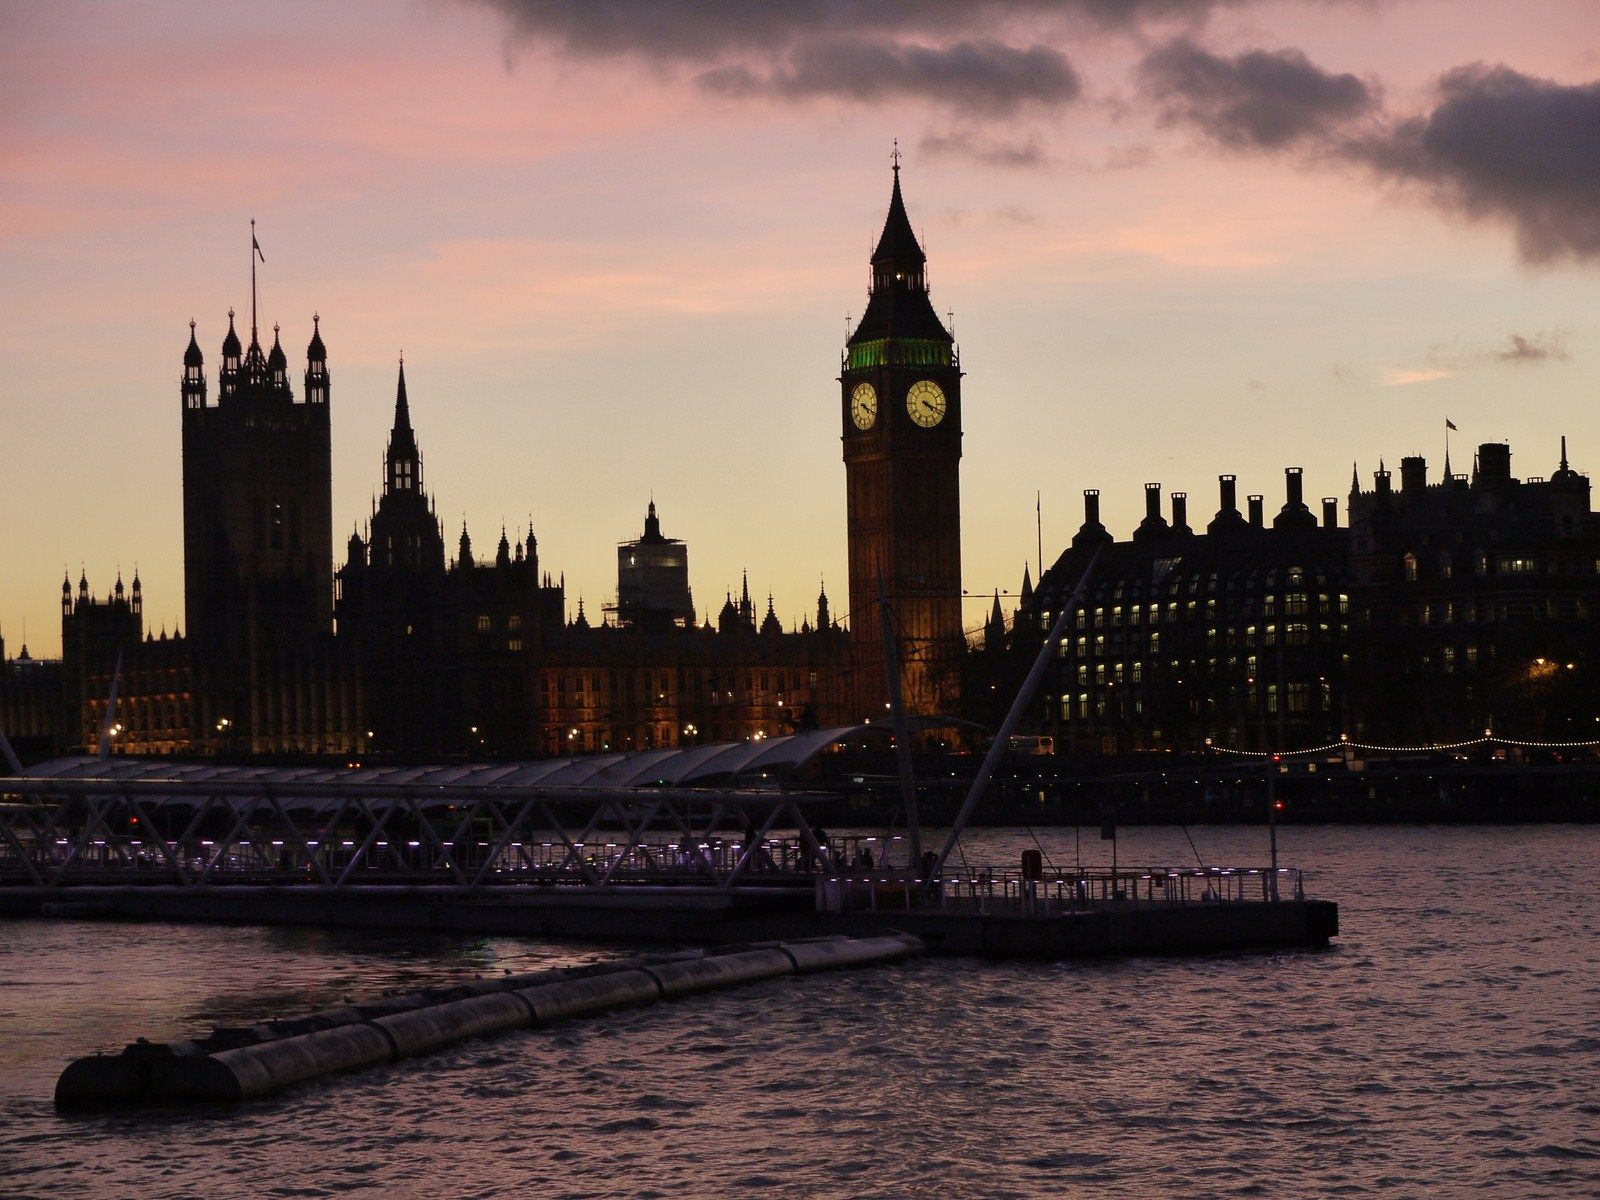 Clock Tower at dusk OP